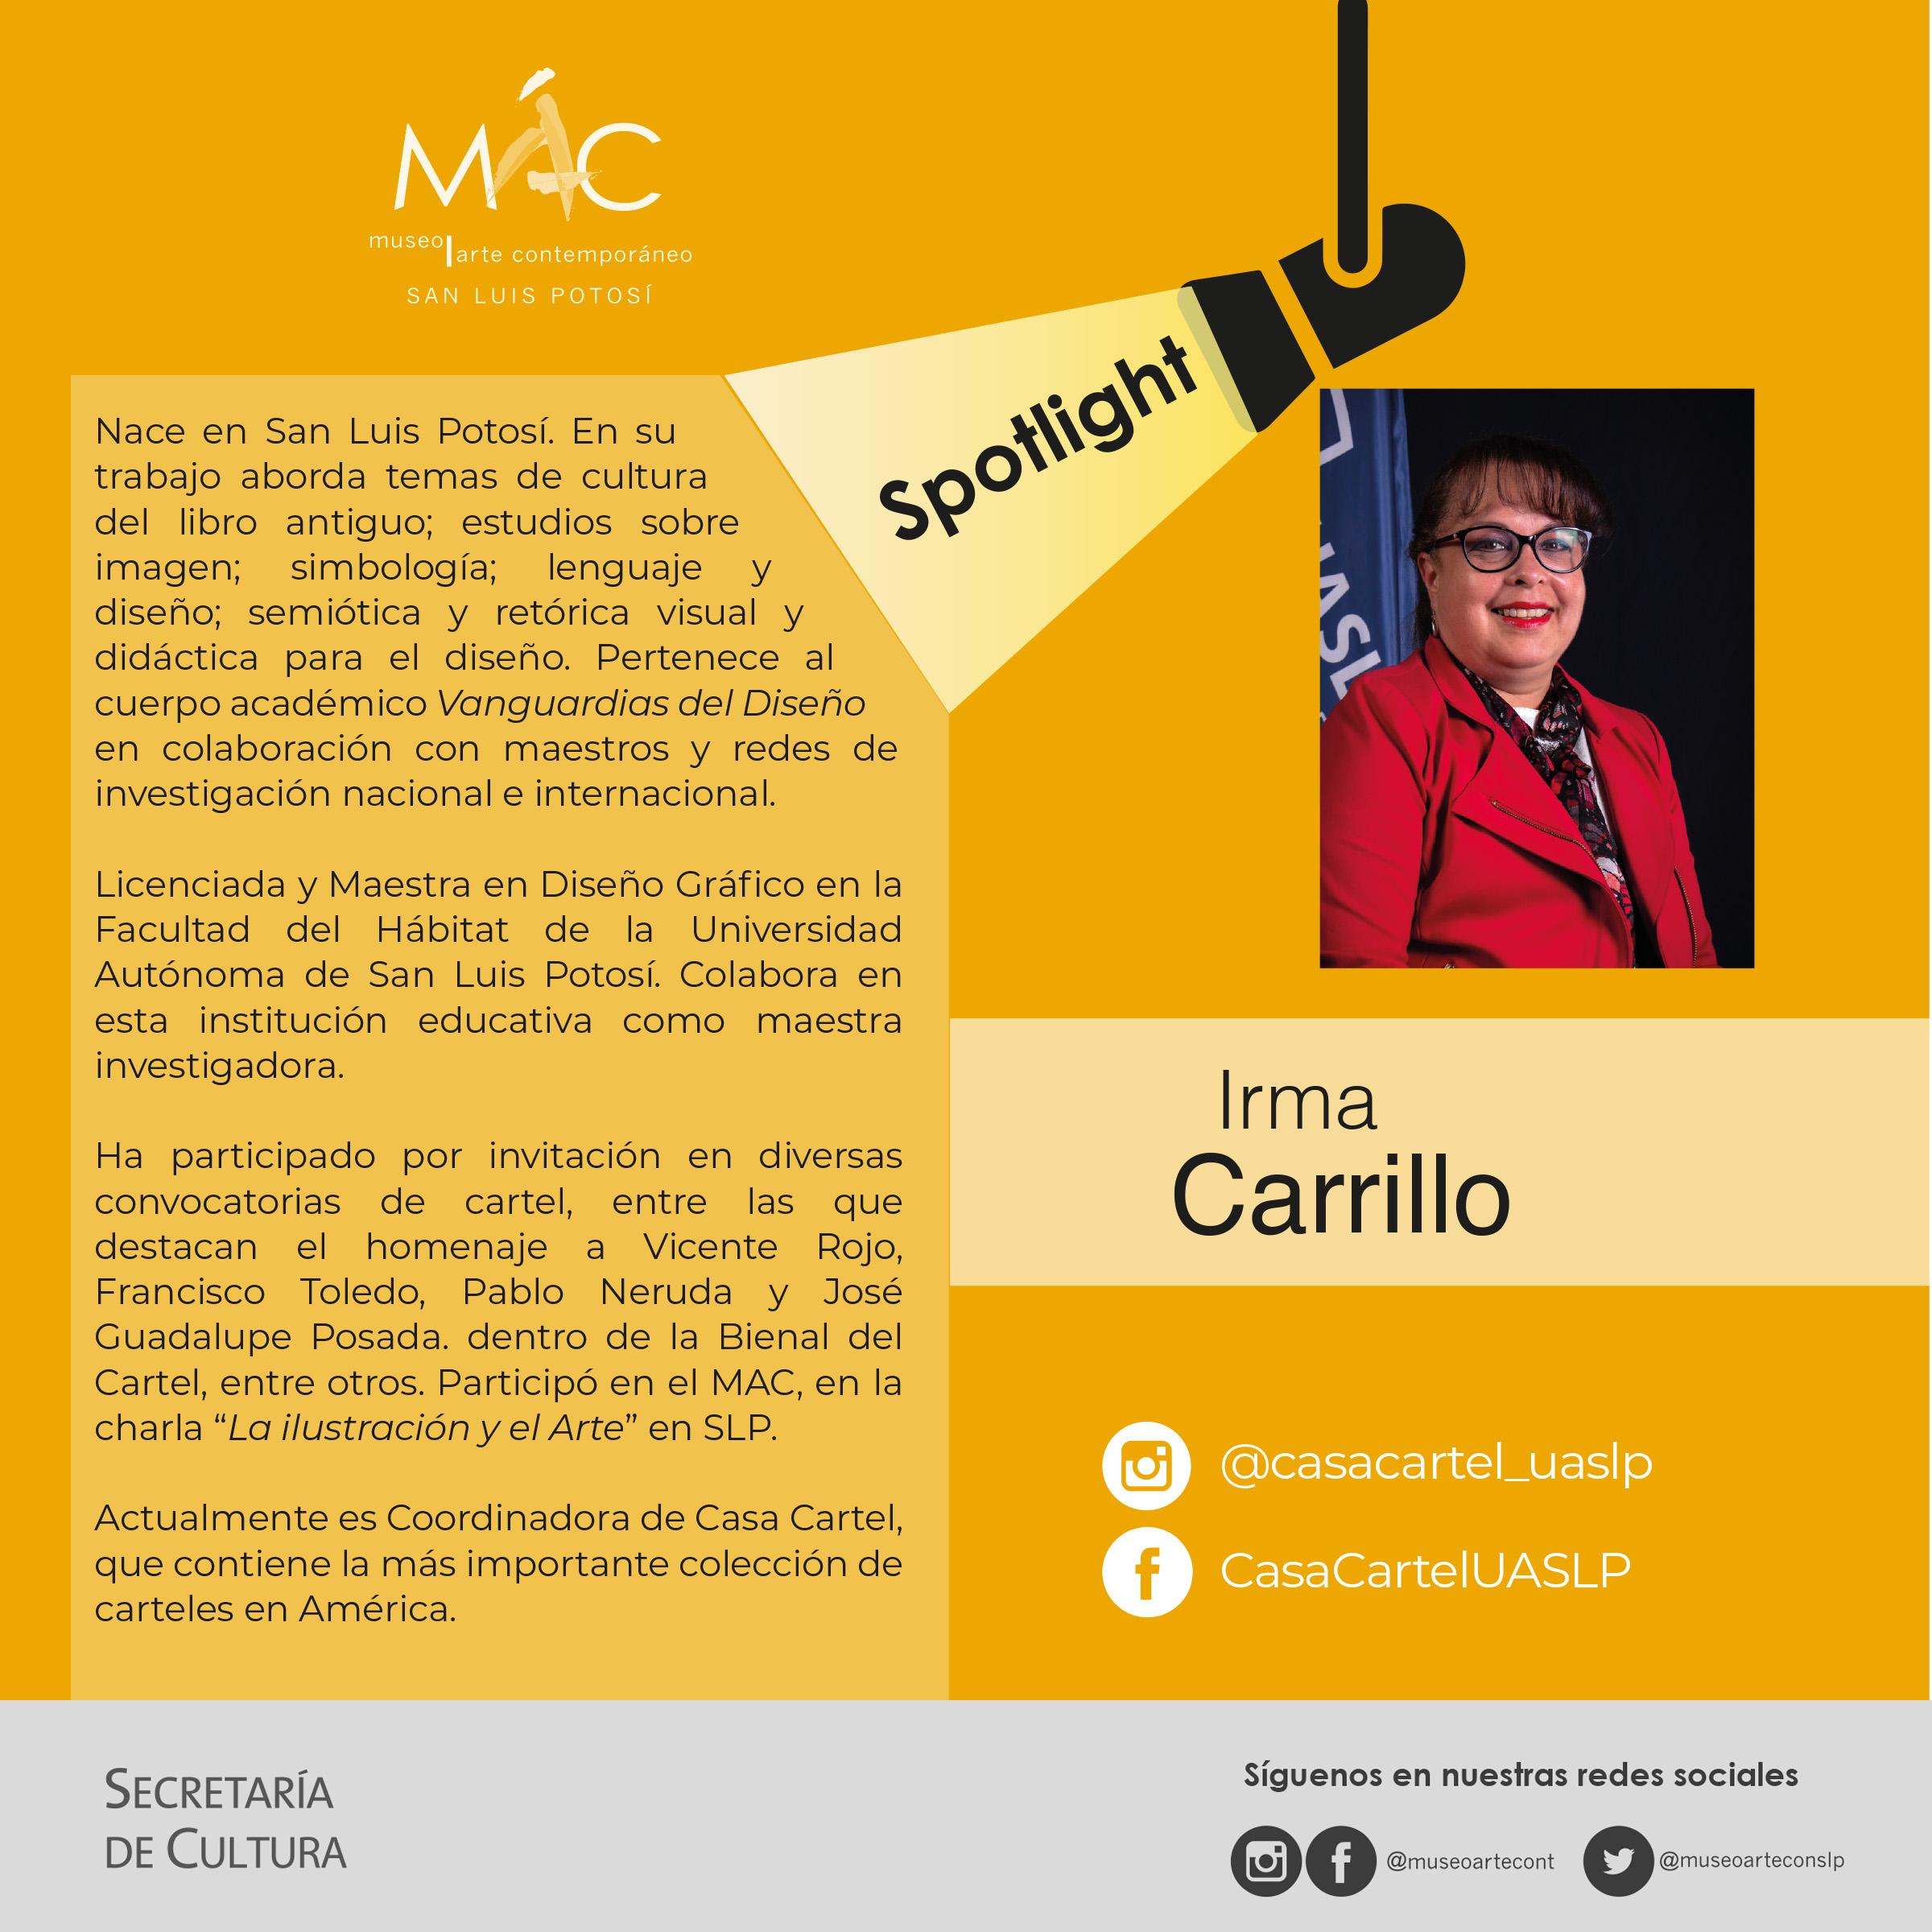 irma_carrillo